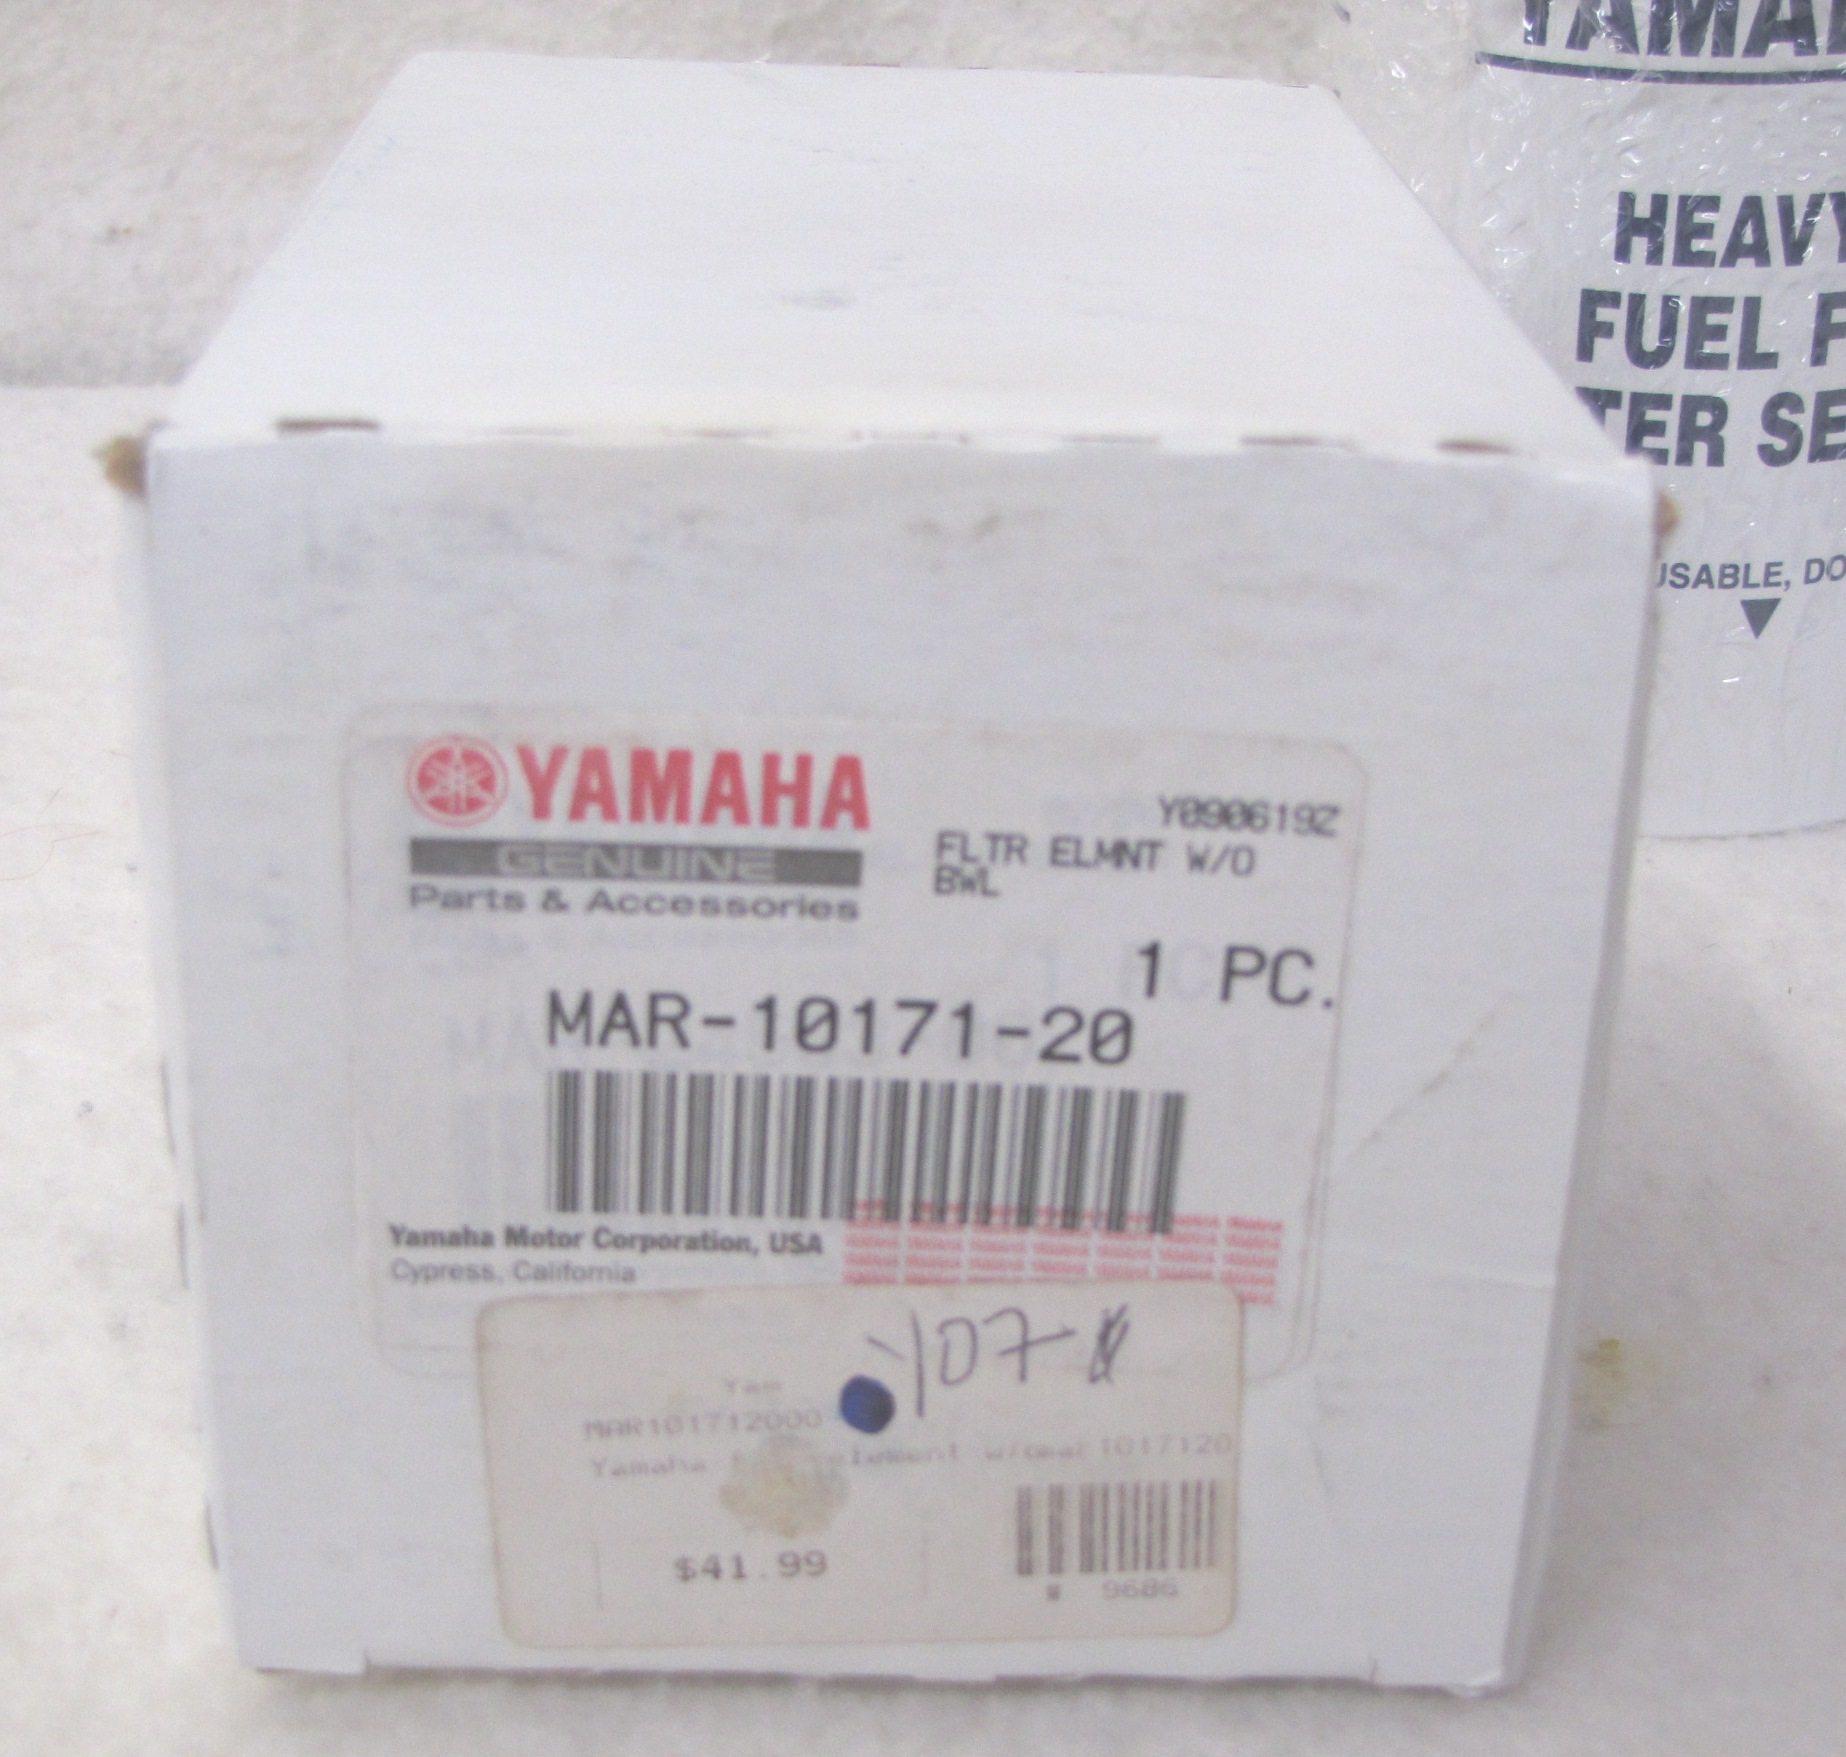 Yamaha Outboard Heavy Duty Fuel Filter Element Mar 10171 20 00